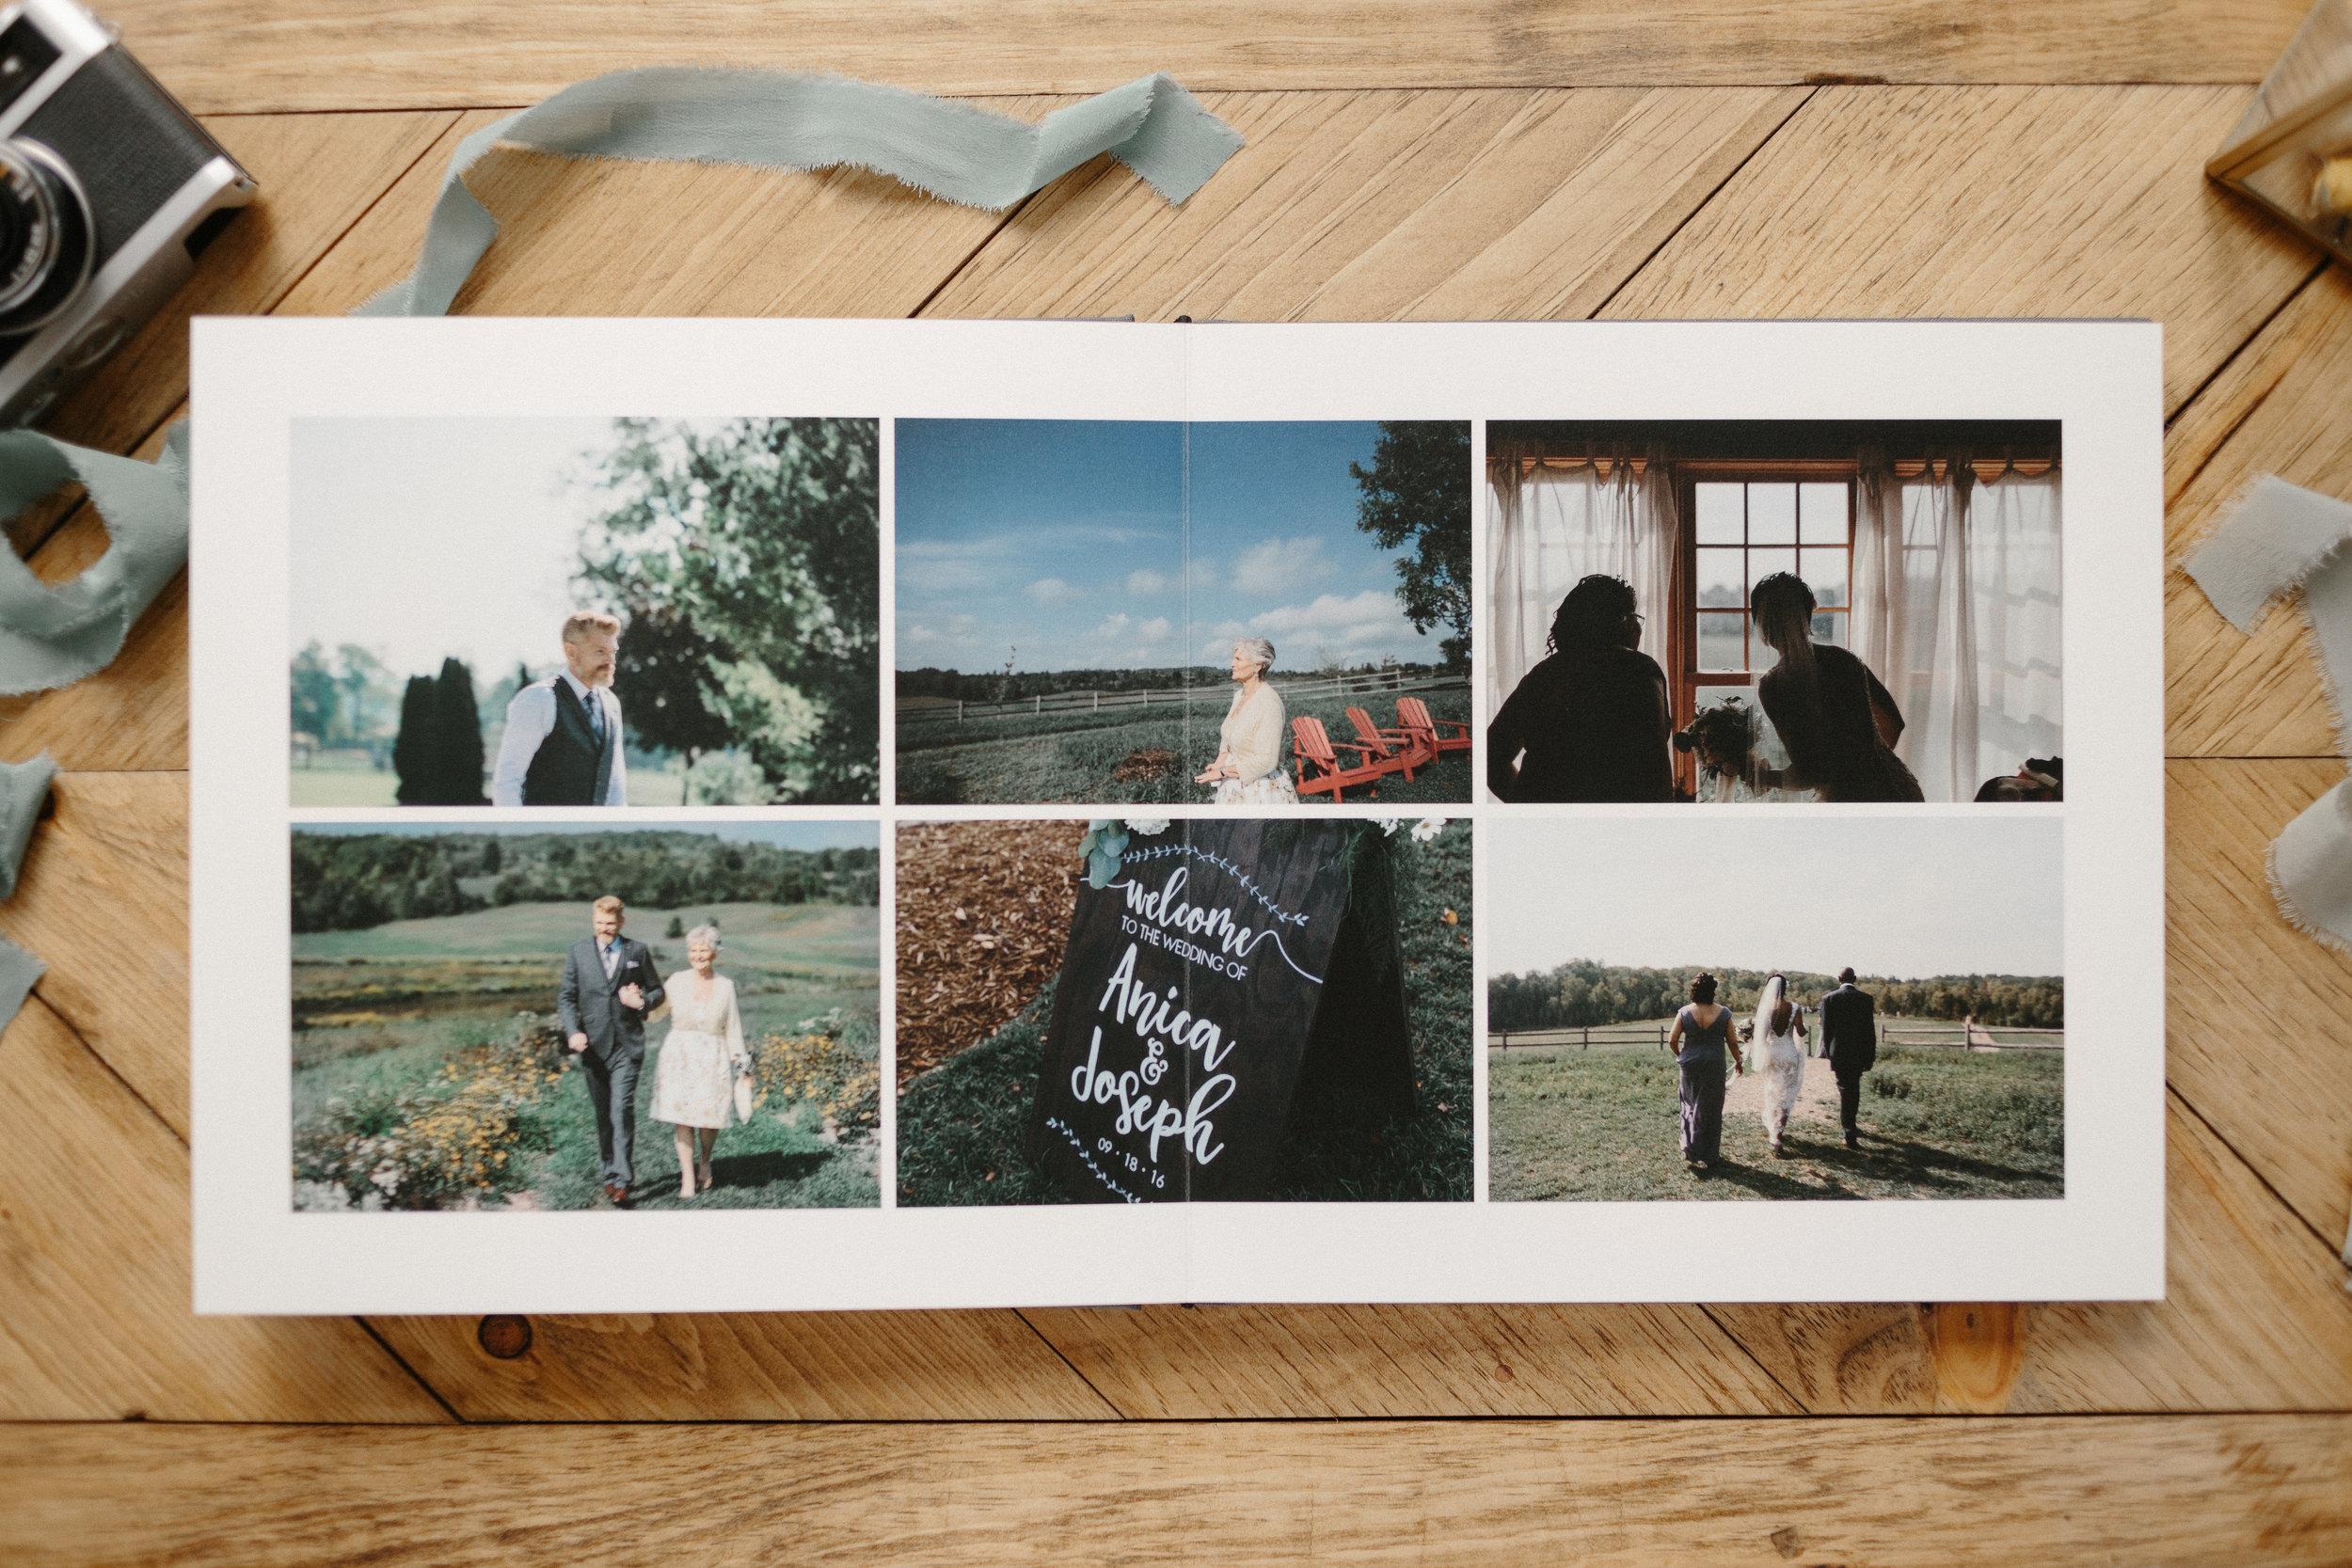 ryanne-hollies-photography-wedding-album-design-details-tono-and-co-artifact-uprising-87.jpg